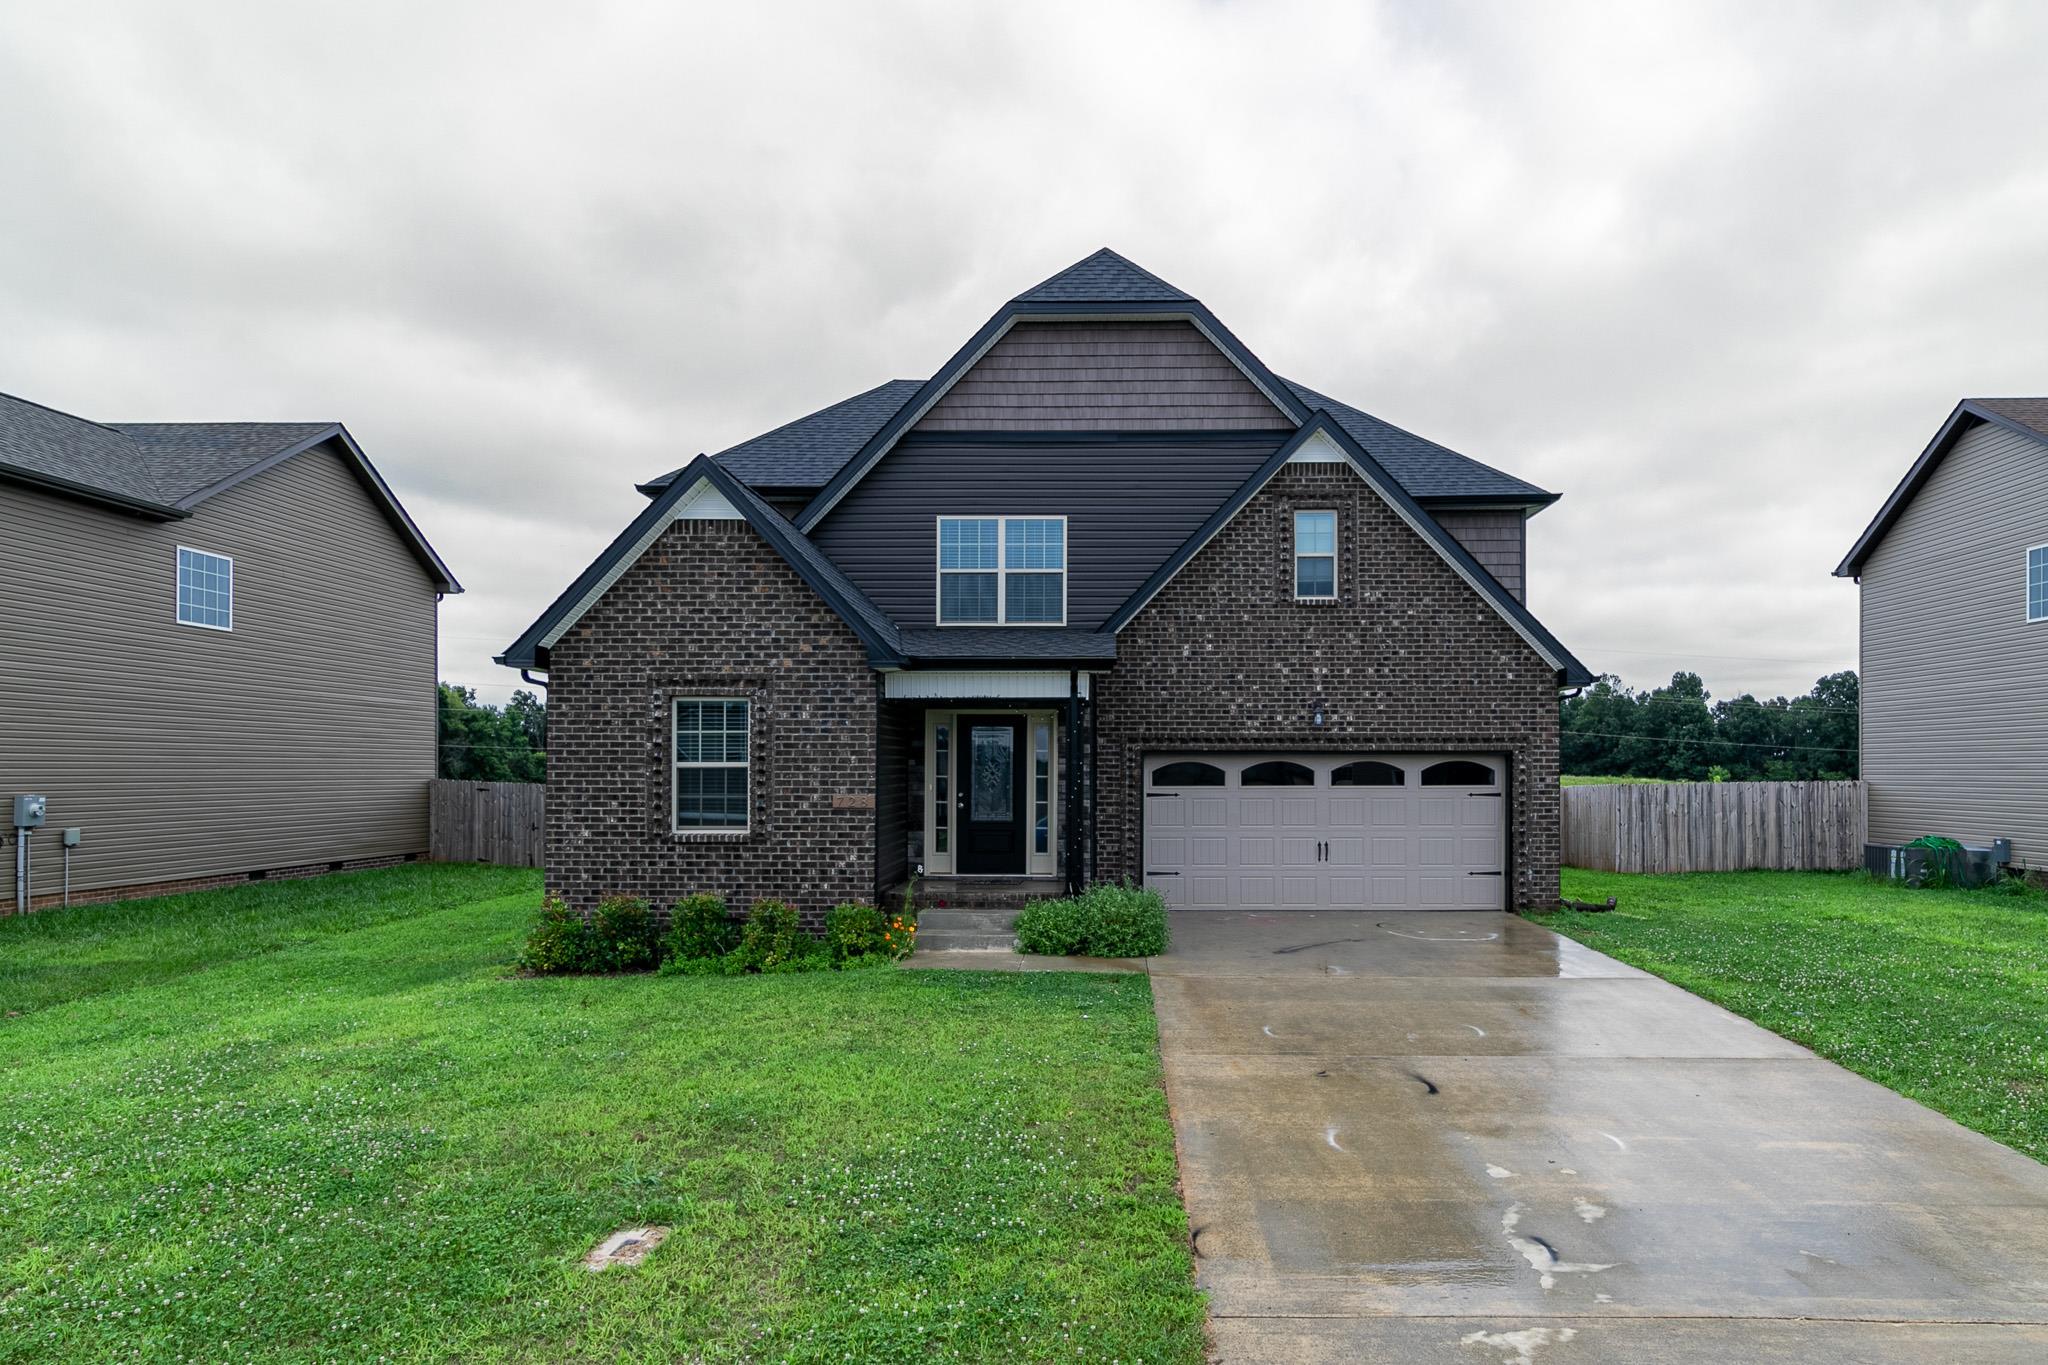 728 Crestone Ln, Clarksville, TN 37042 - Clarksville, TN real estate listing